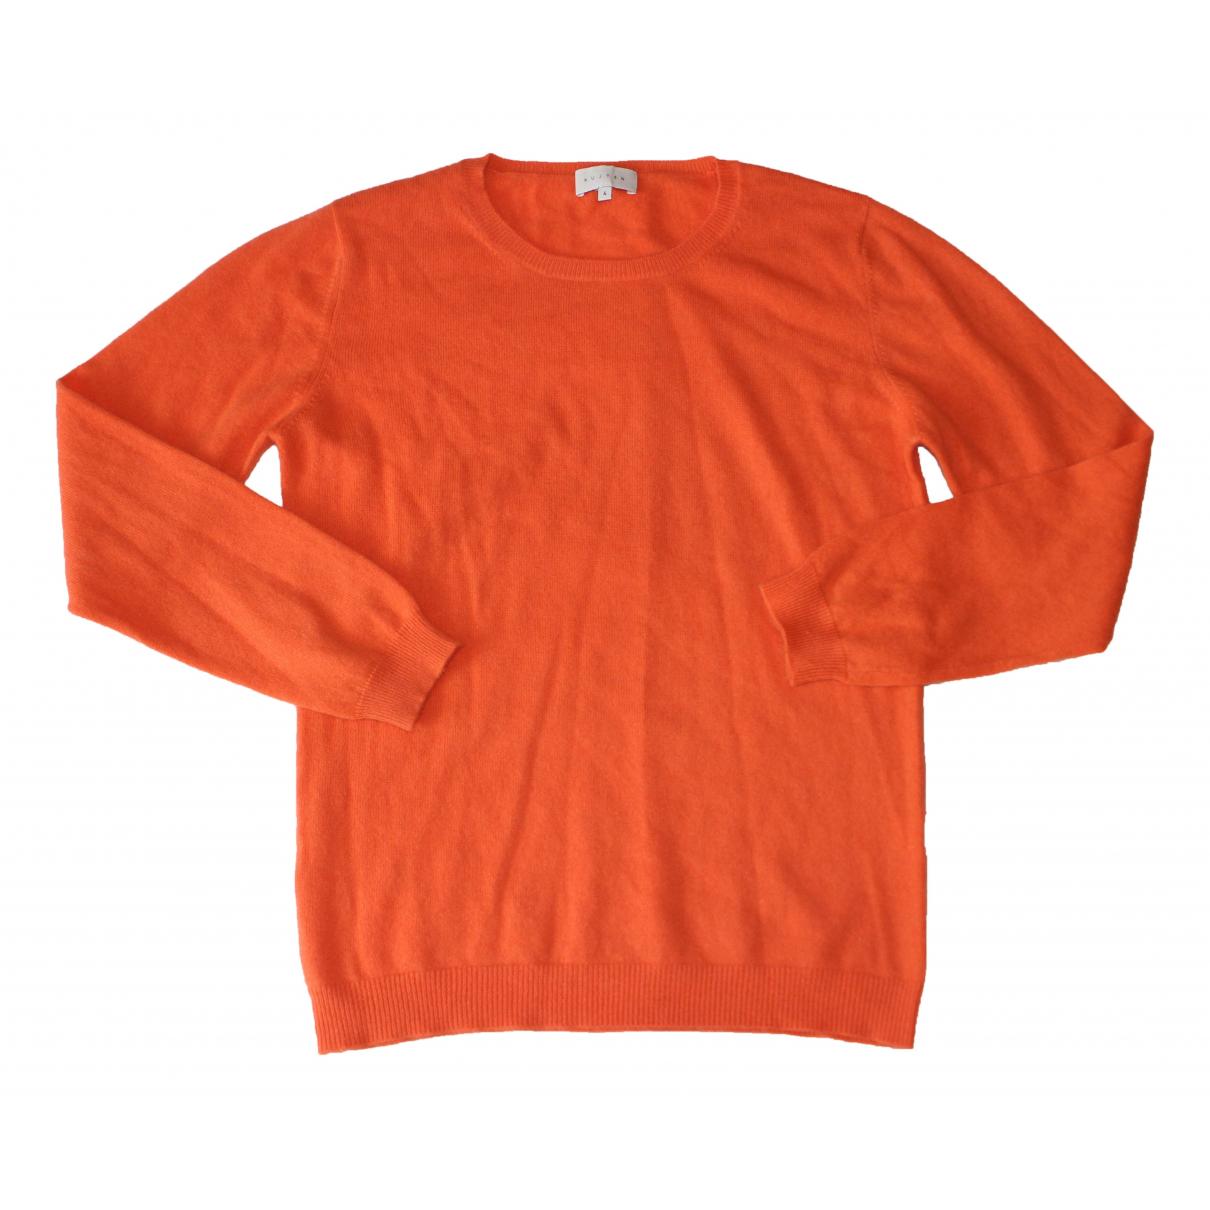 Kujten - Pull   pour femme en cachemire - orange